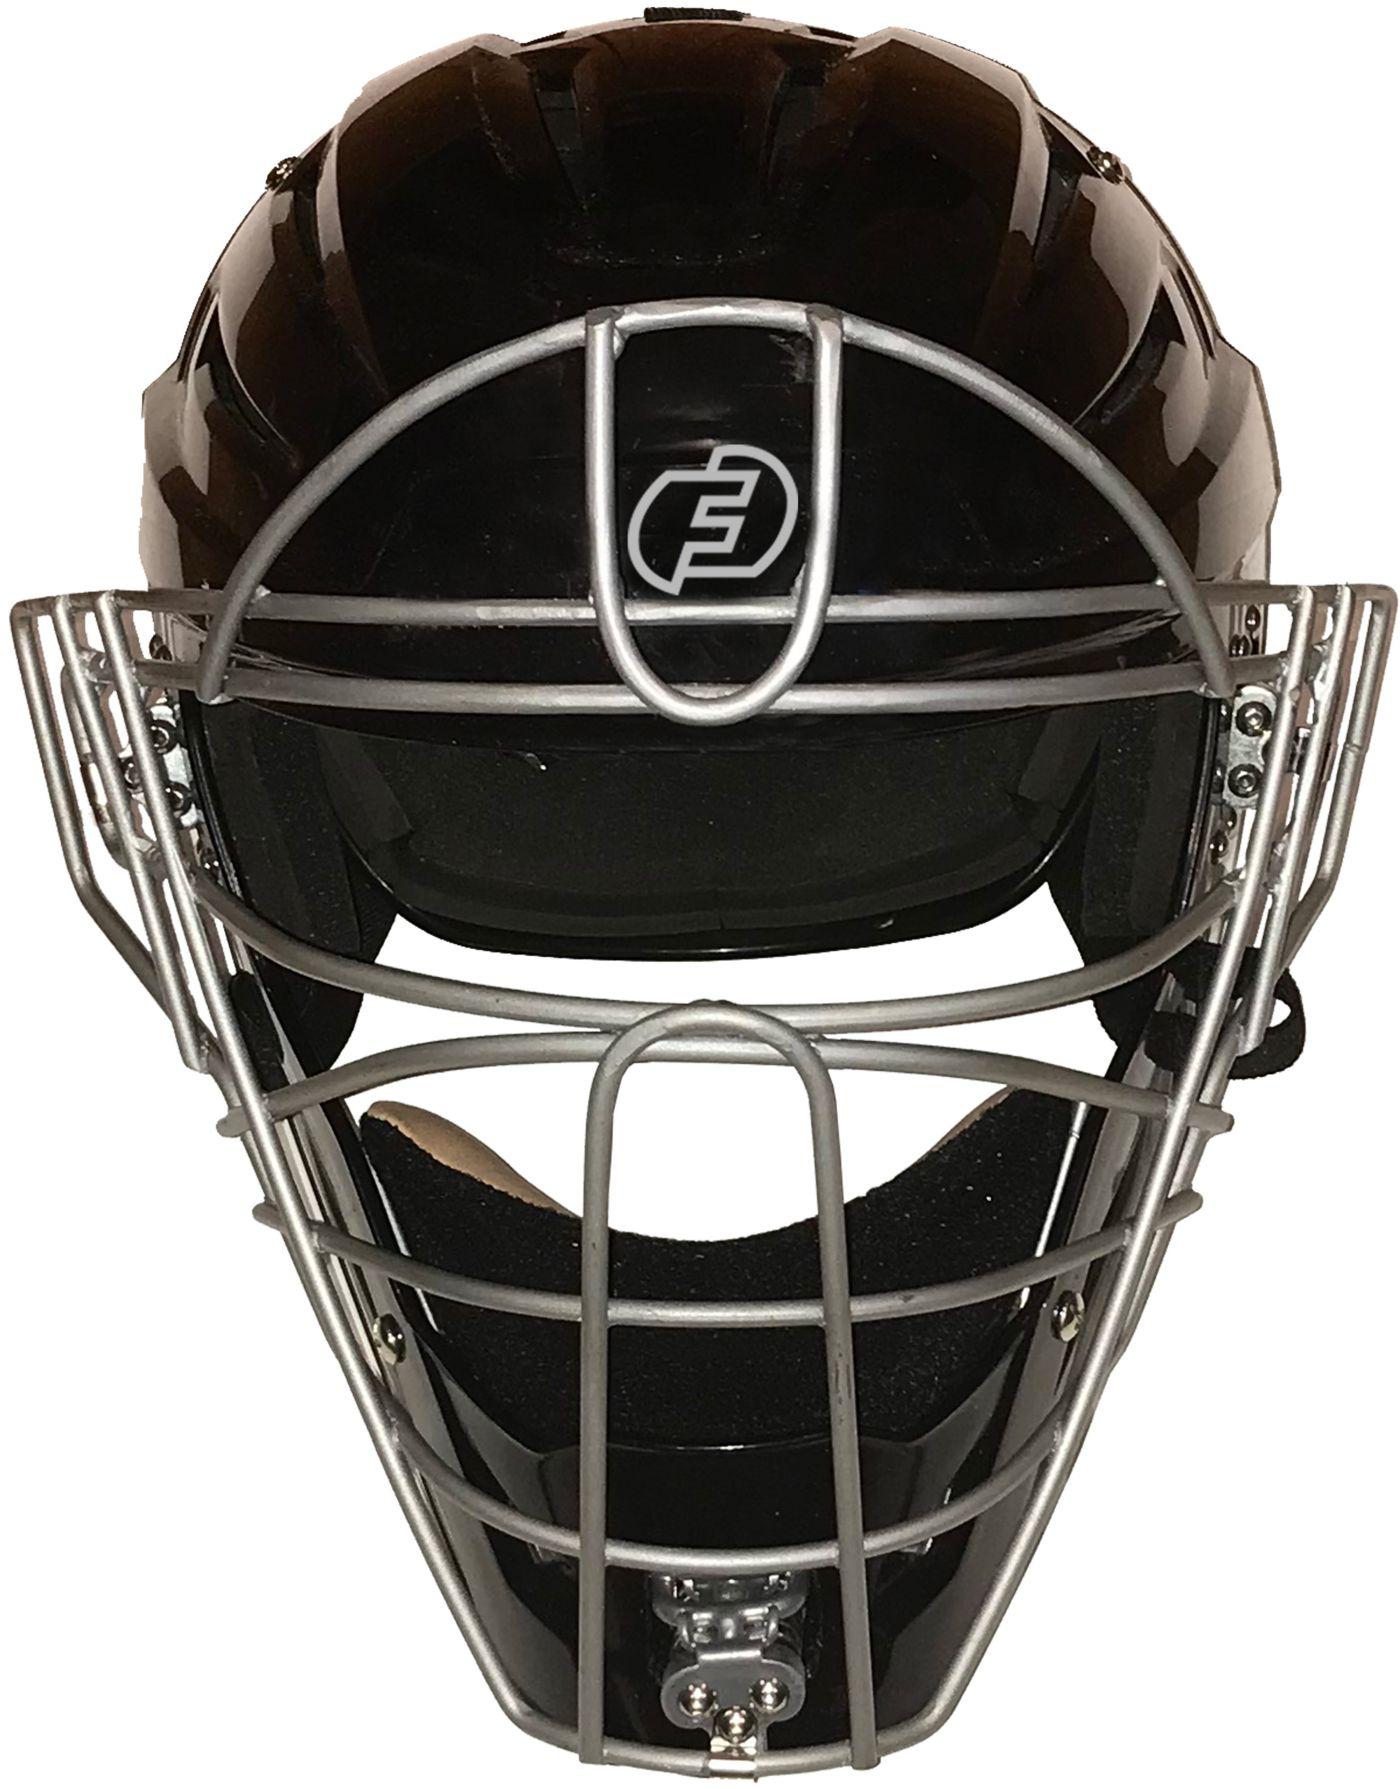 Force3 Youth Pro Gear V2 Defender Catcher's Mask